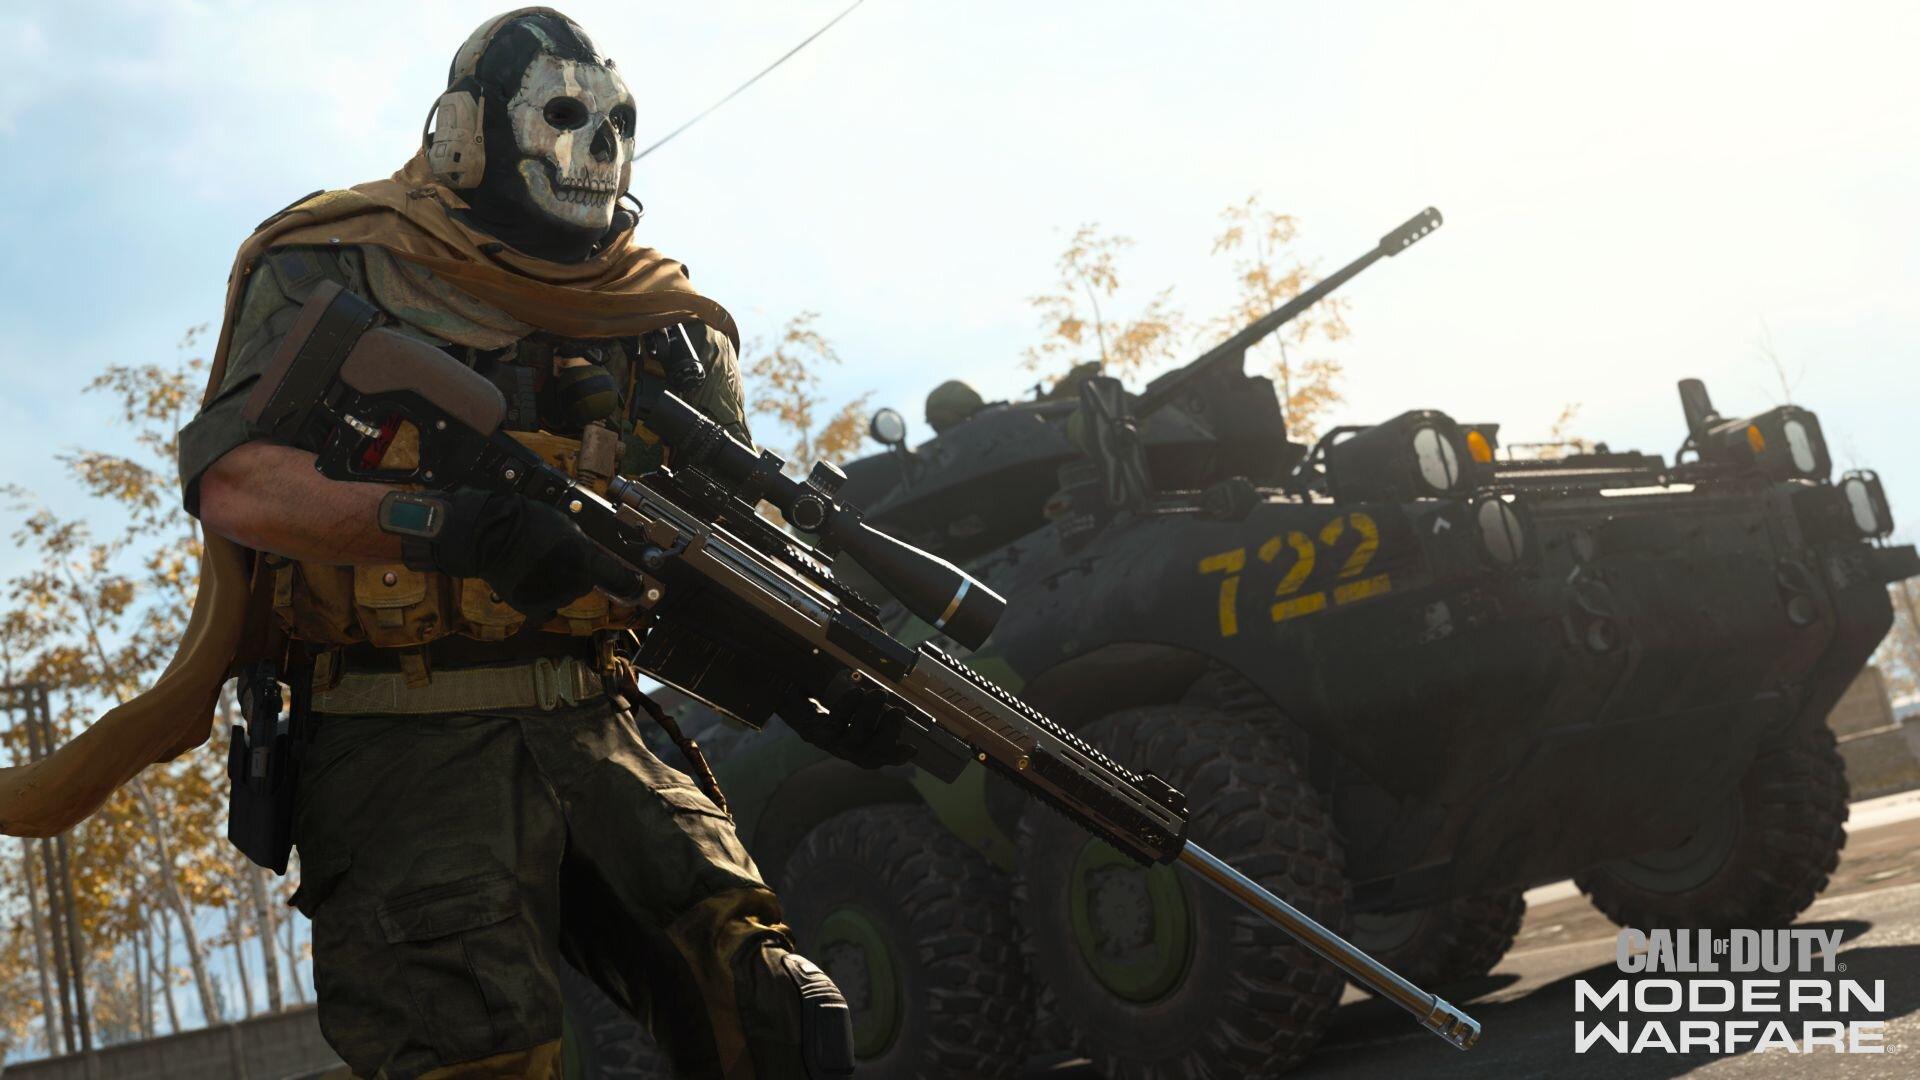 Season Two Of Call Of Duty Modern Warfare Is Live Today Geektyrant